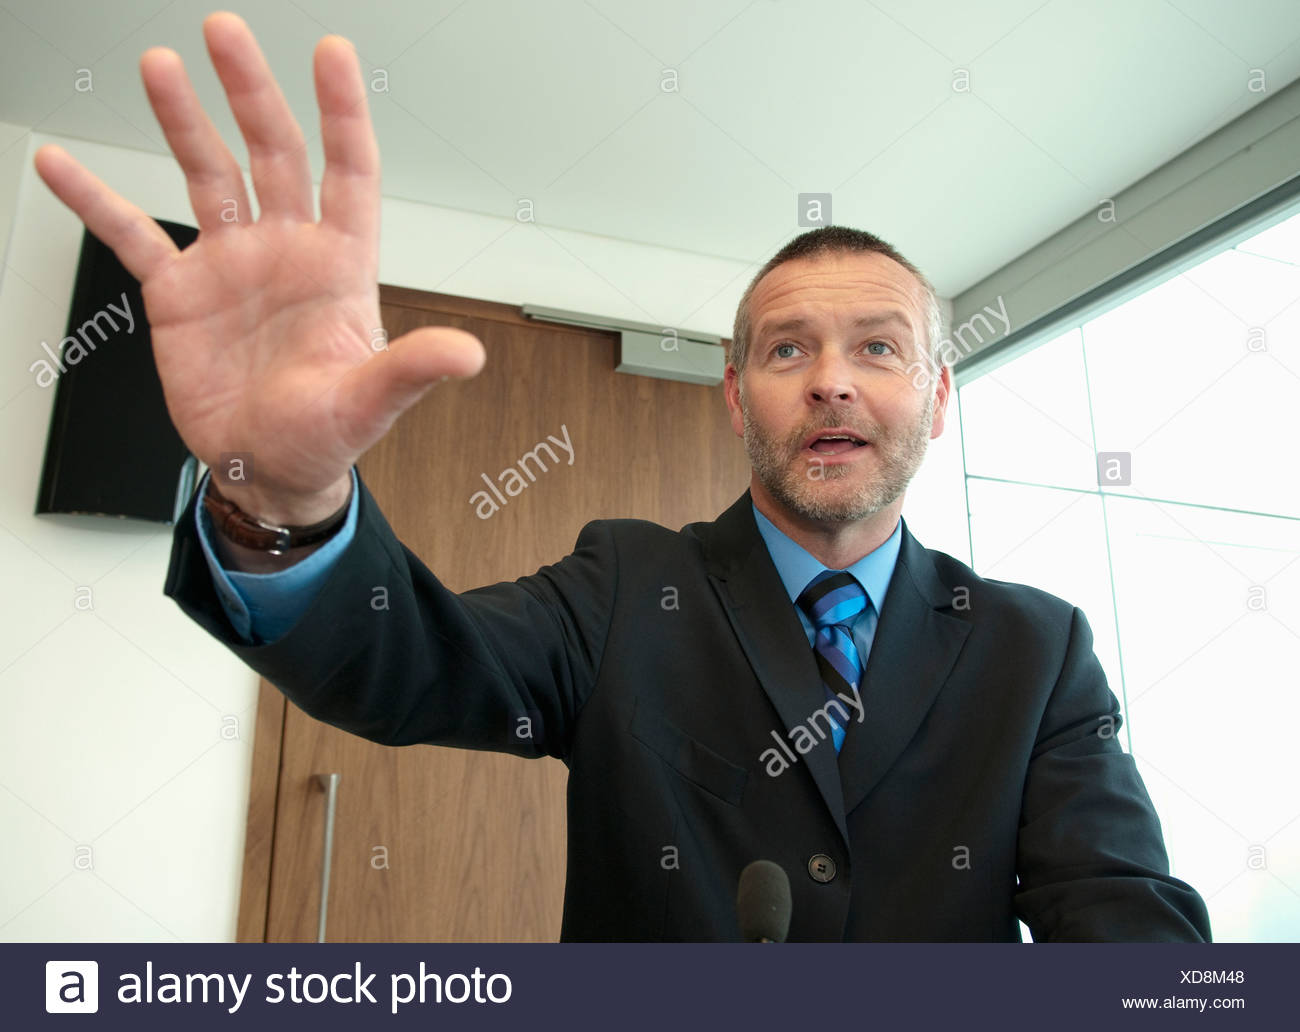 Unternehmensführer hält Rede Stockfoto